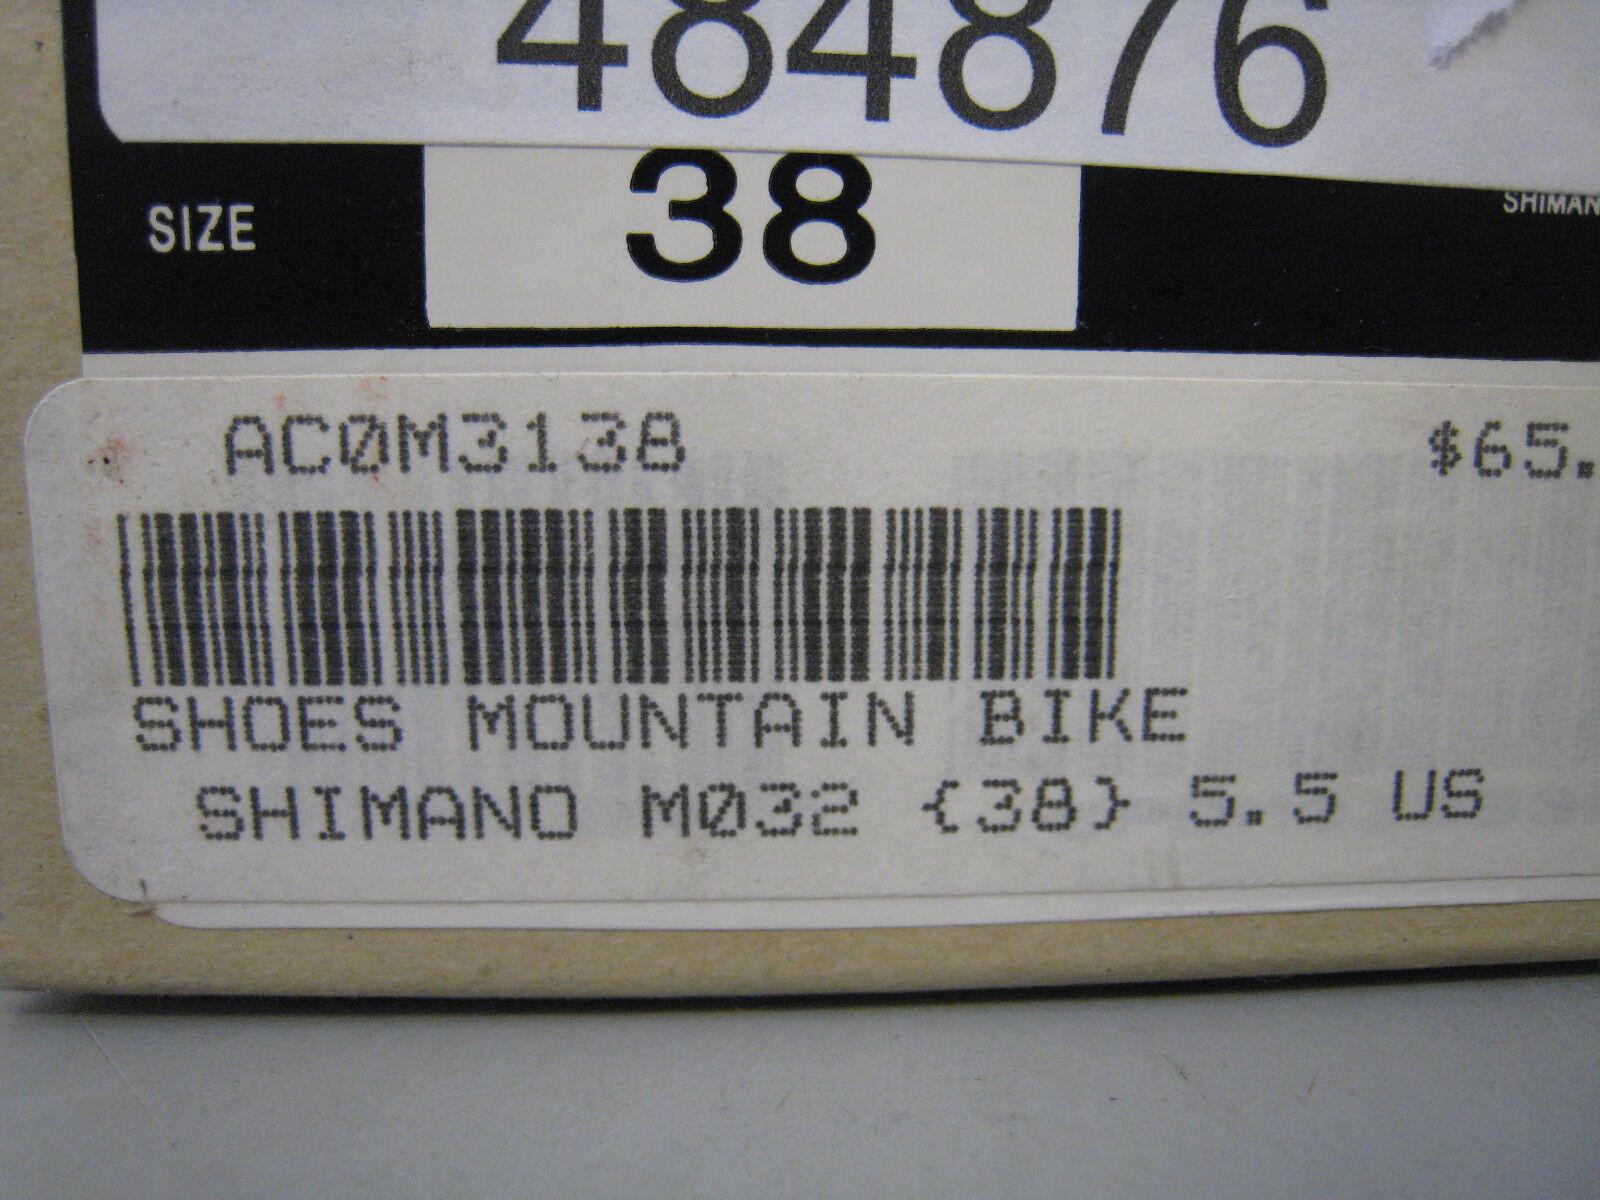 NOS Shimano Shimano Shimano SH-M032 Mountain Bike Biking Racing Schuhes  Herren Größe 38 US 5.5 3fecdc